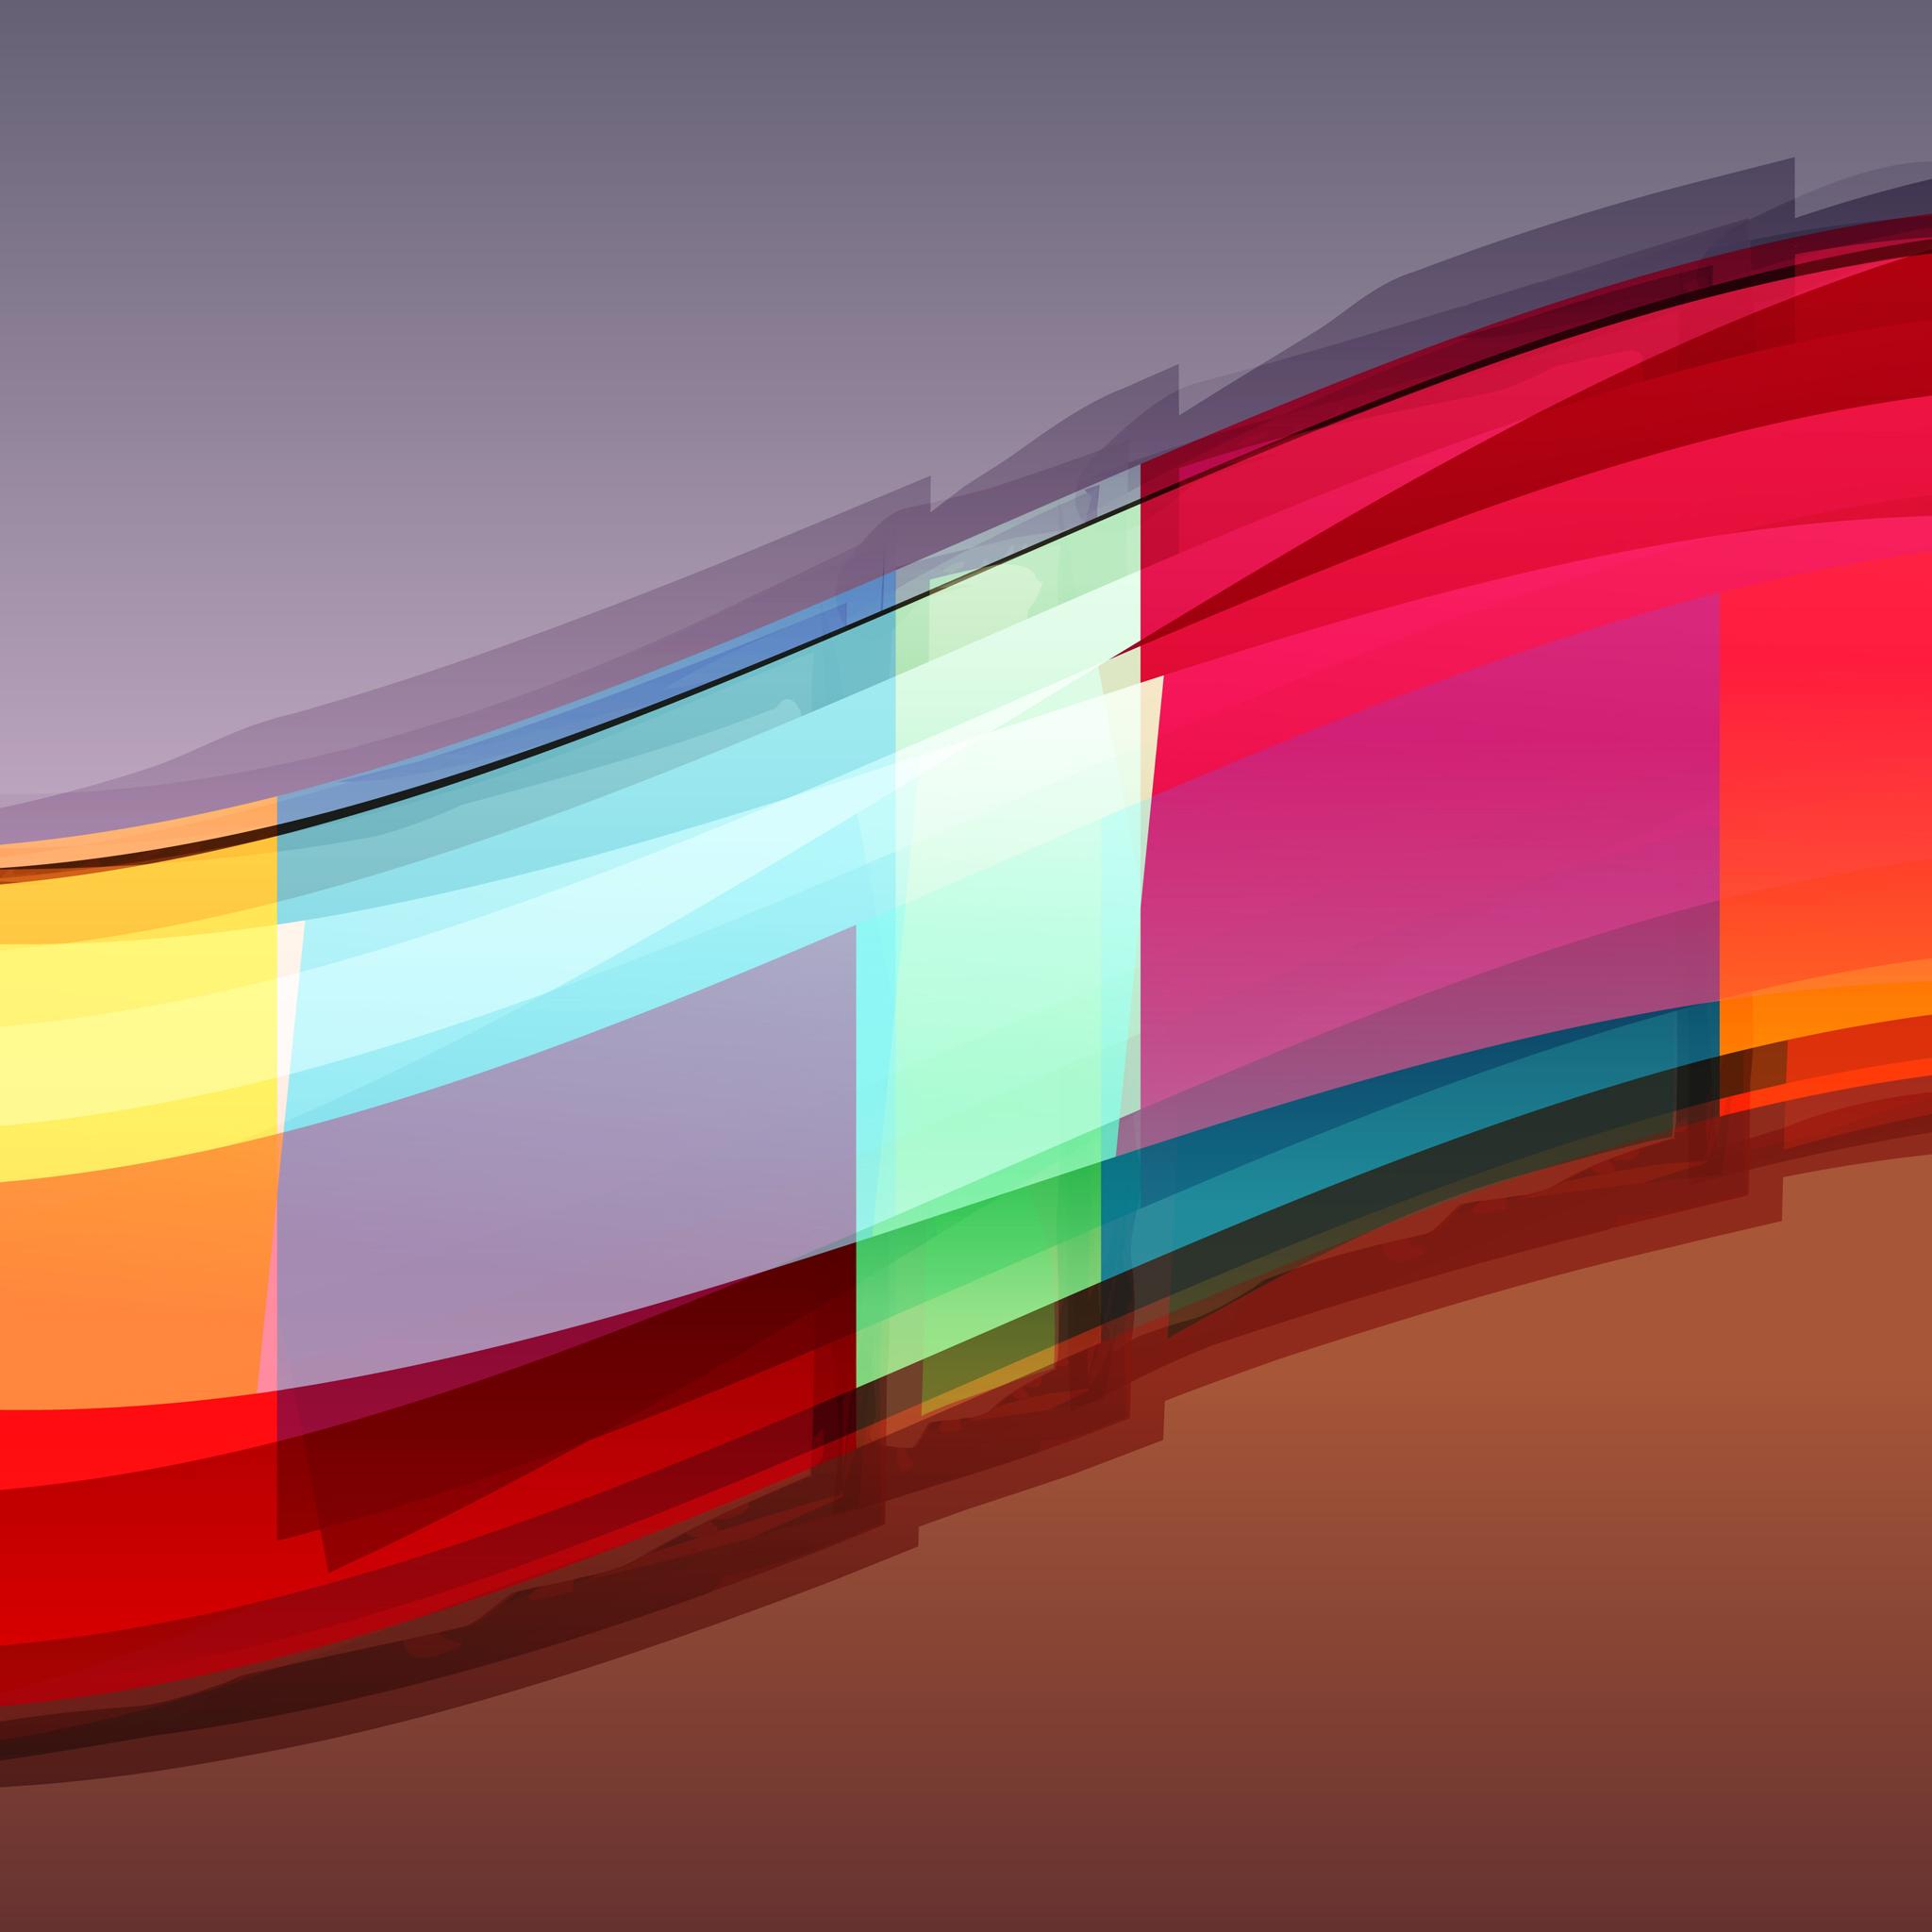 Livewire_3Wallpapers iPad Retina